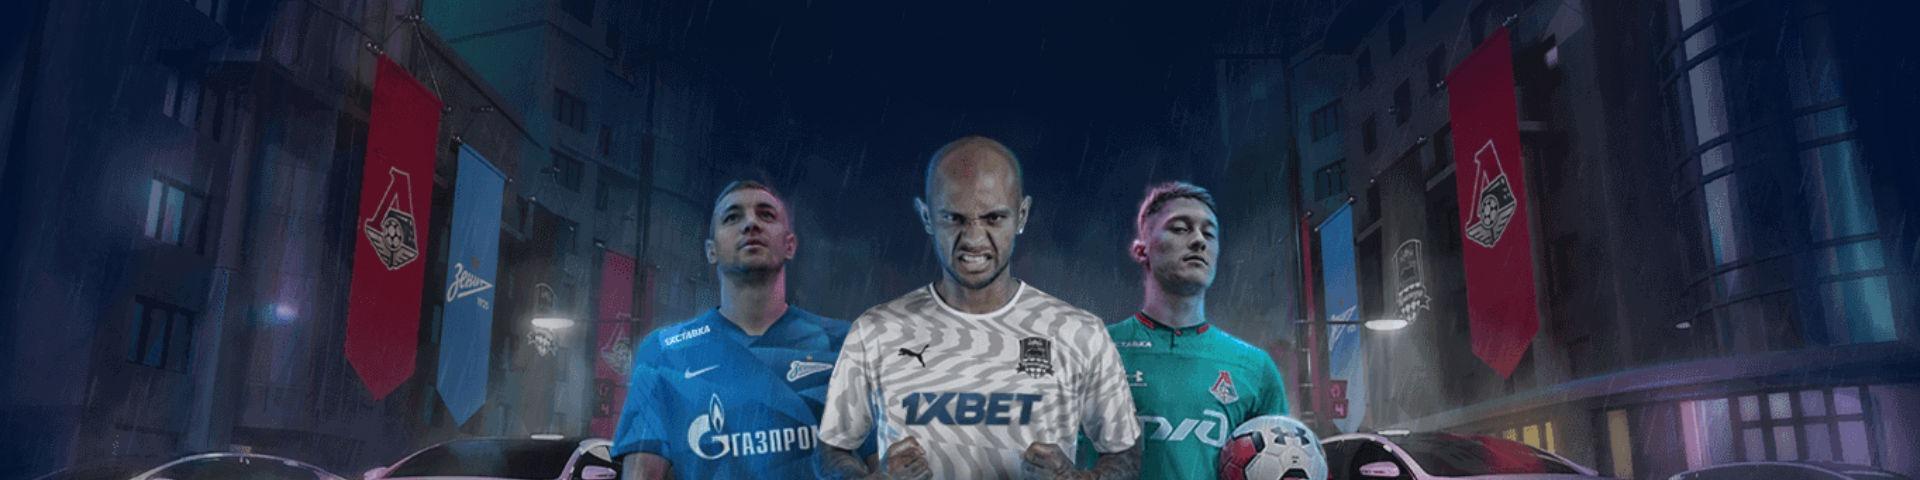 БК «1хСтавка»: KIA Optima за набор футбольной фэнтези-команды